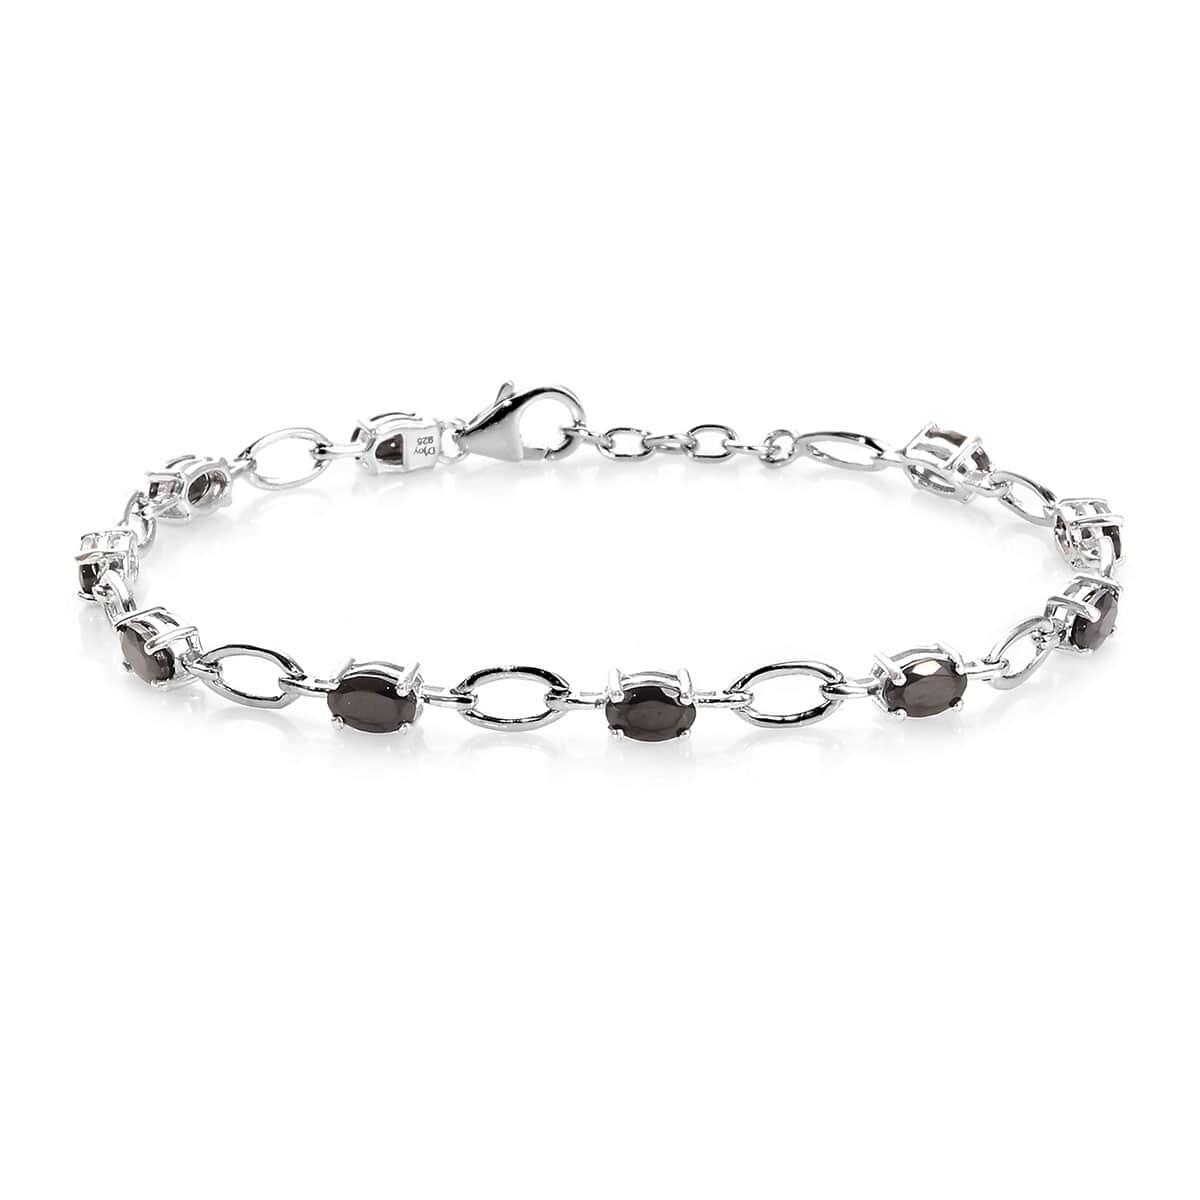 Sterling Silver Platinum Plated Shungite Zircon Tennis Bracelet 7.25/'/'